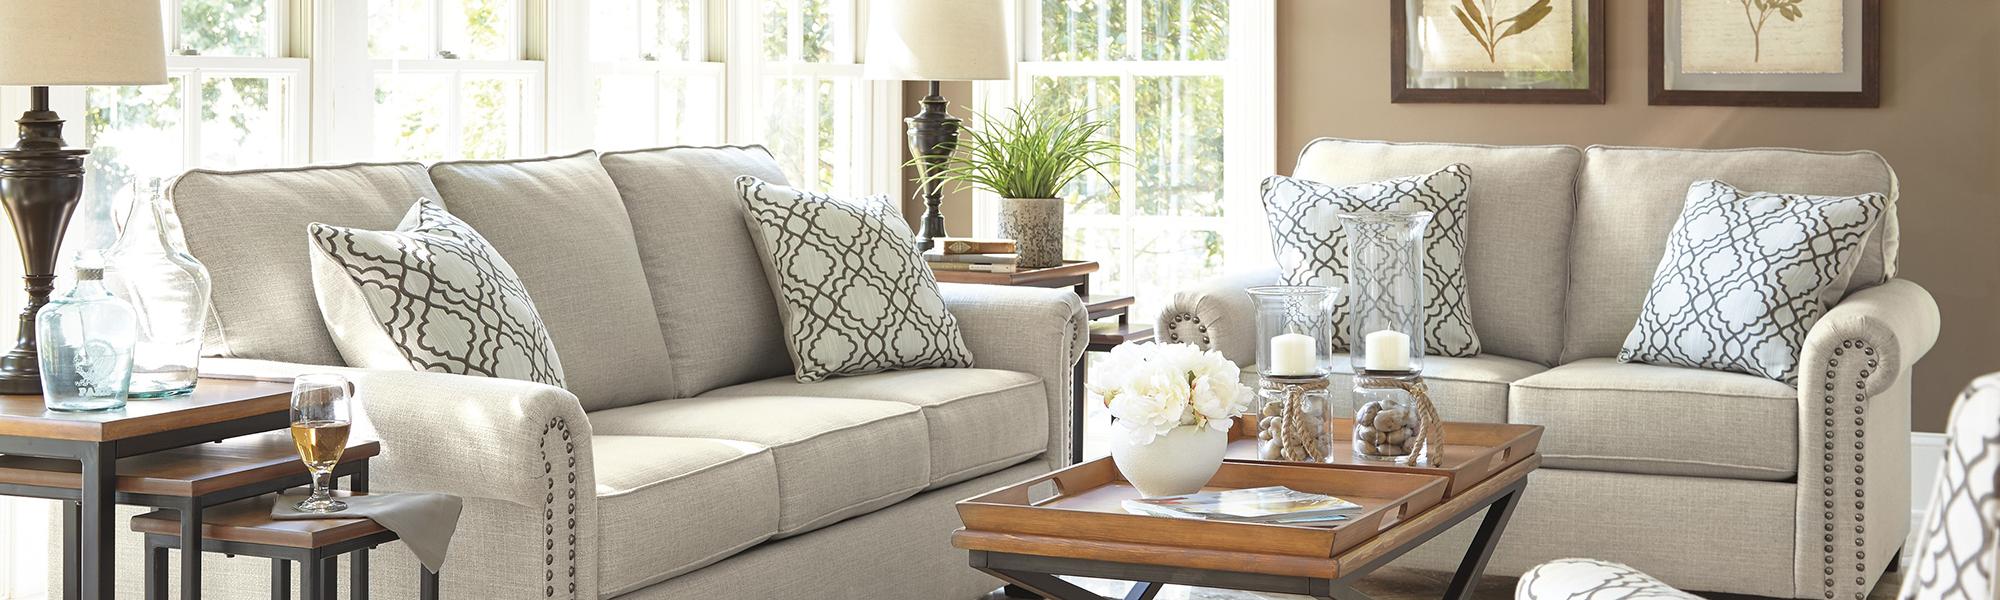 Ashley Furniture Western Living Furniture And Mattresses In Vernal Ut